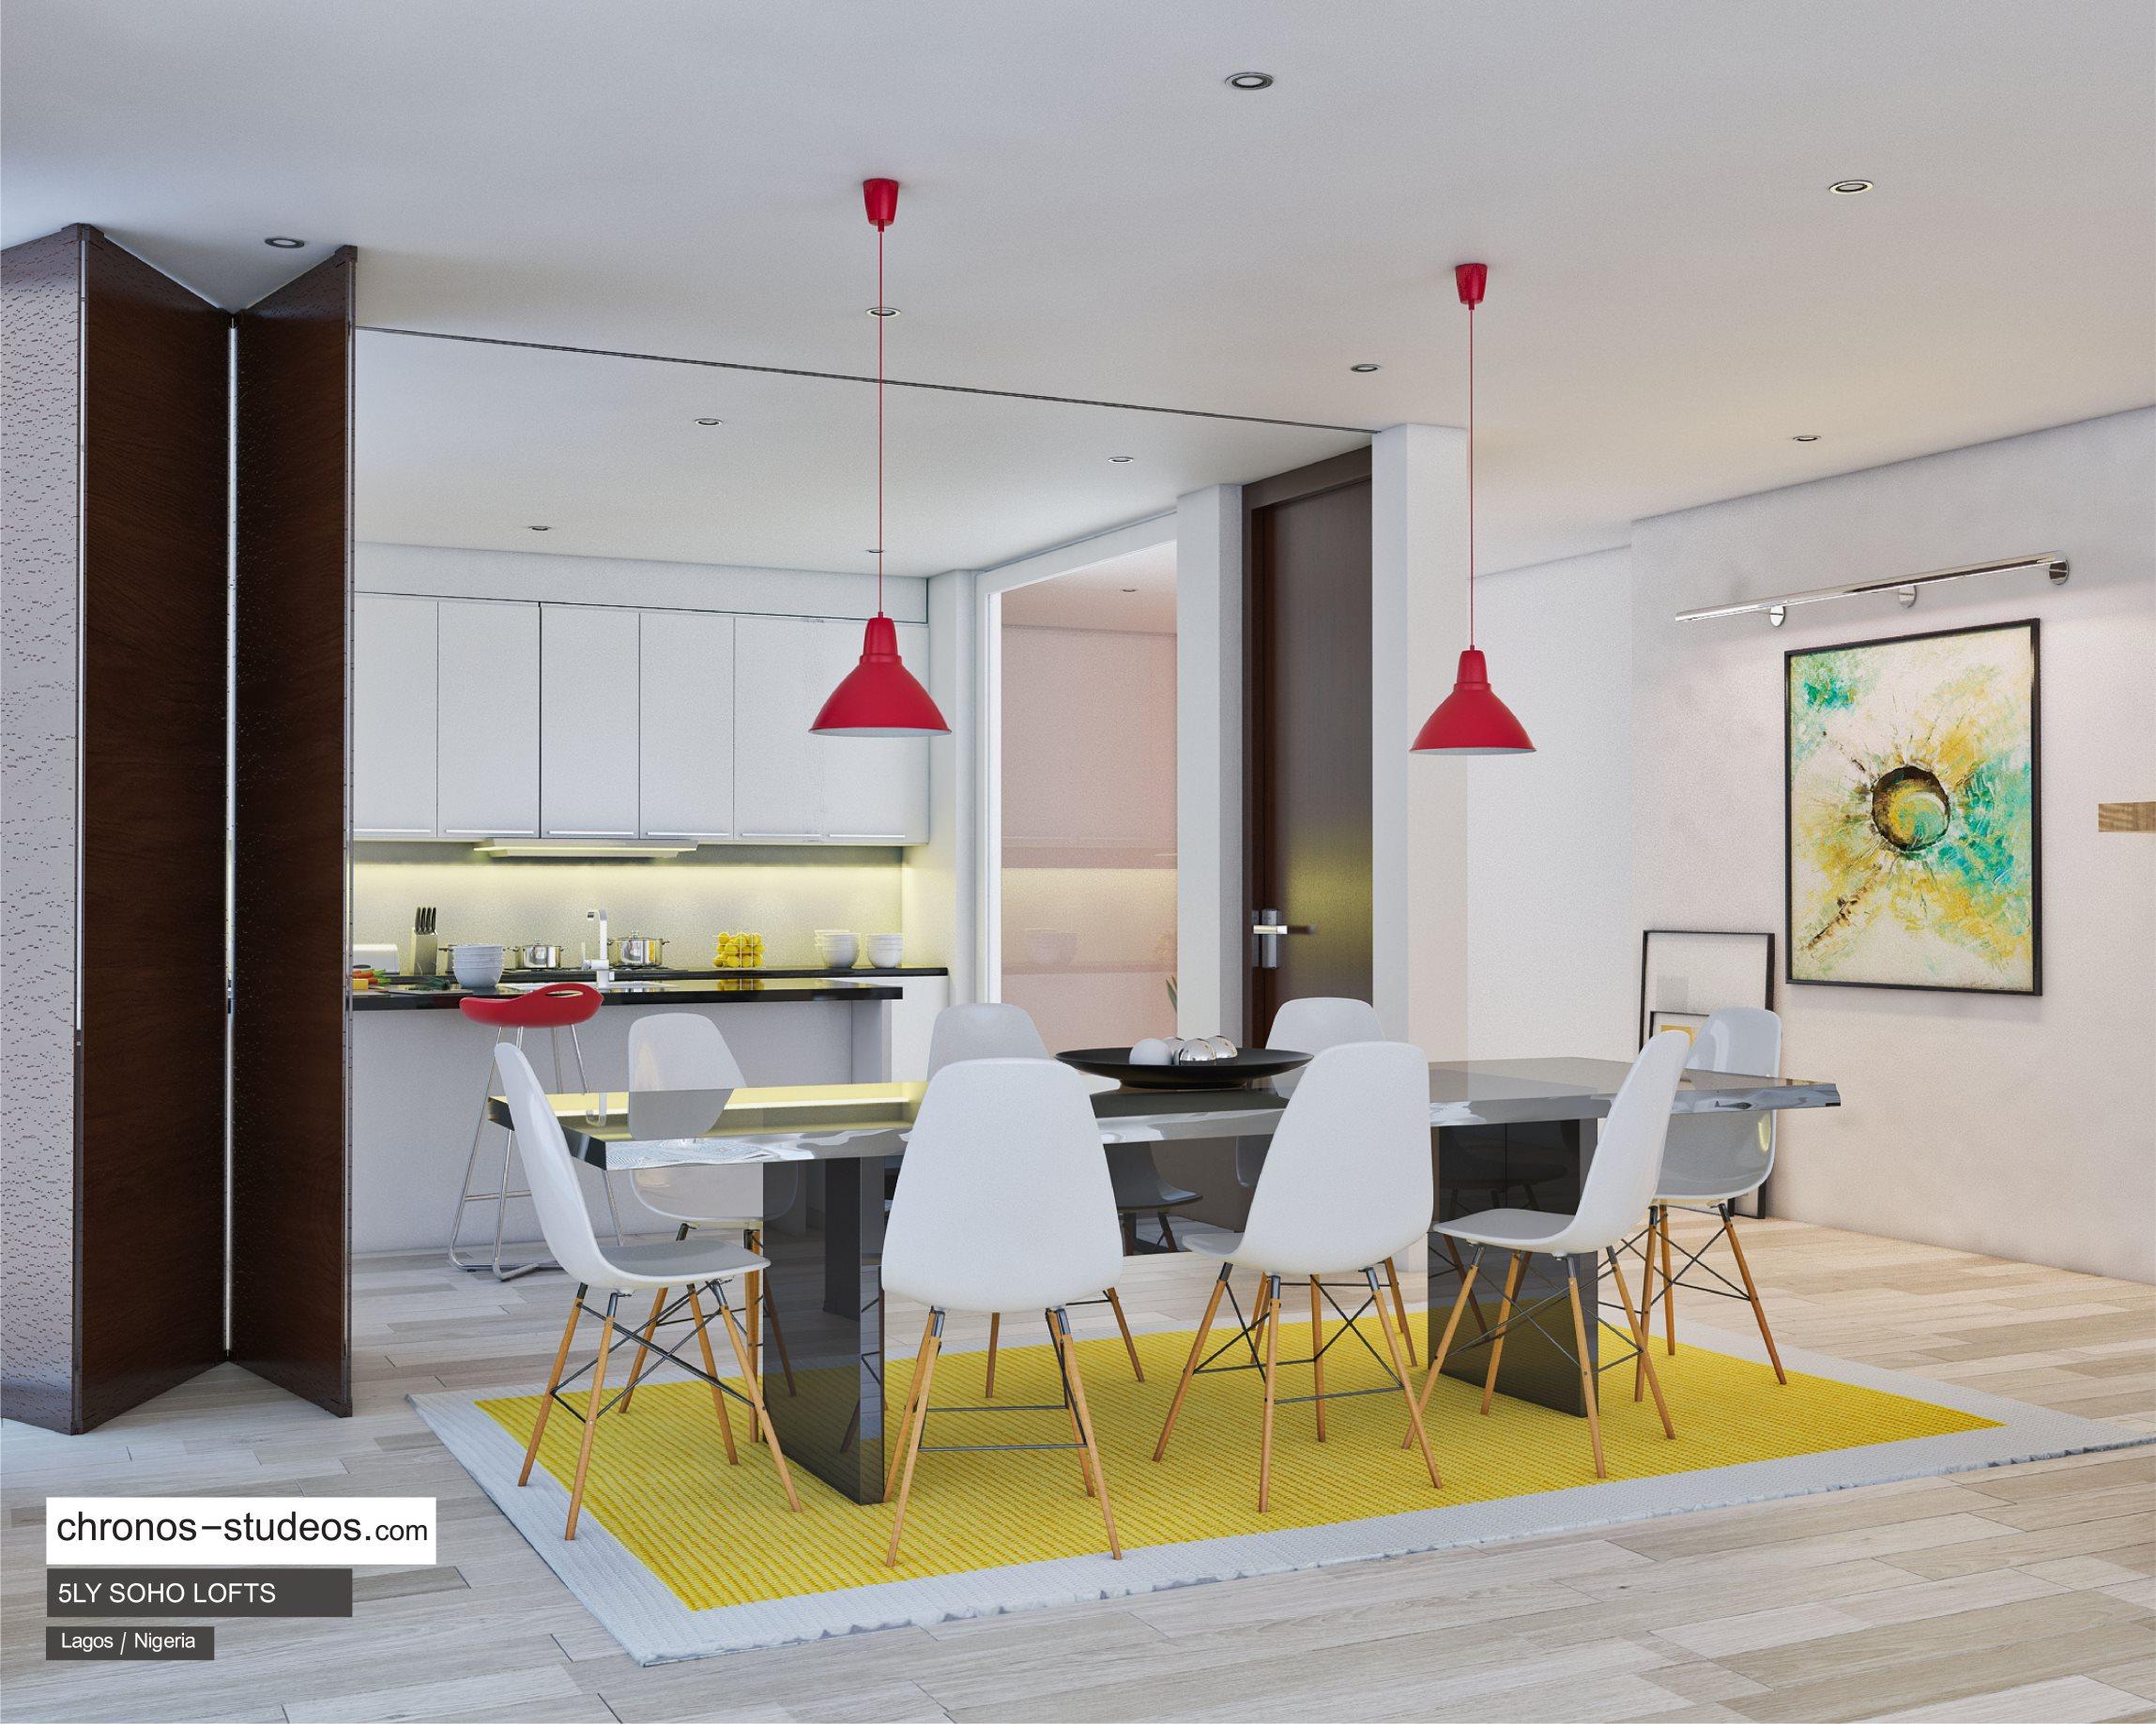 IMAGE: 5LY Soho Loft dining area render by Chronos Studeos